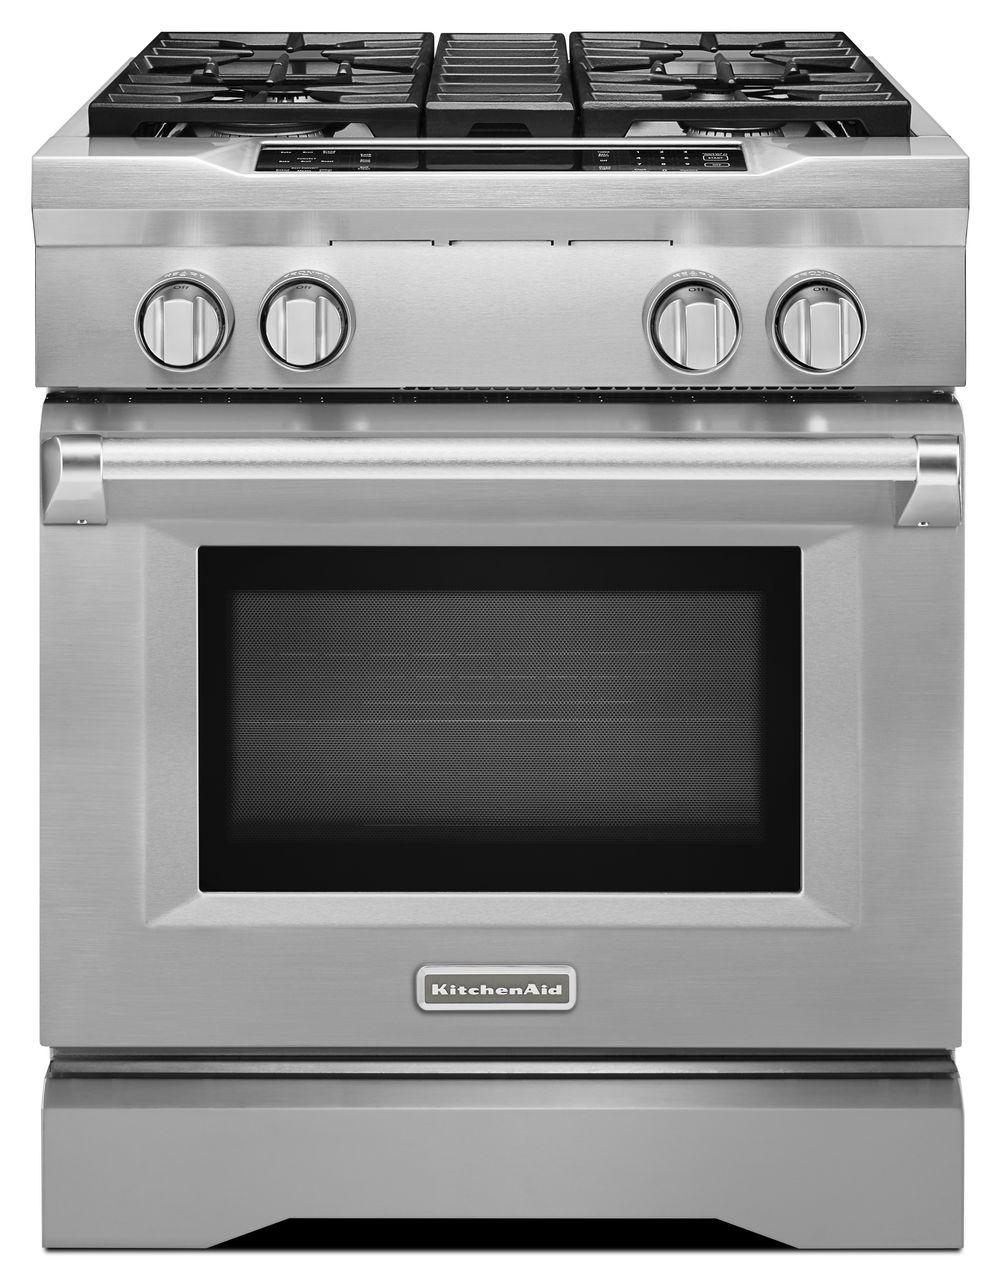 KitchenAid Range/Stove/Oven Model KDRS407VSS04 Parts